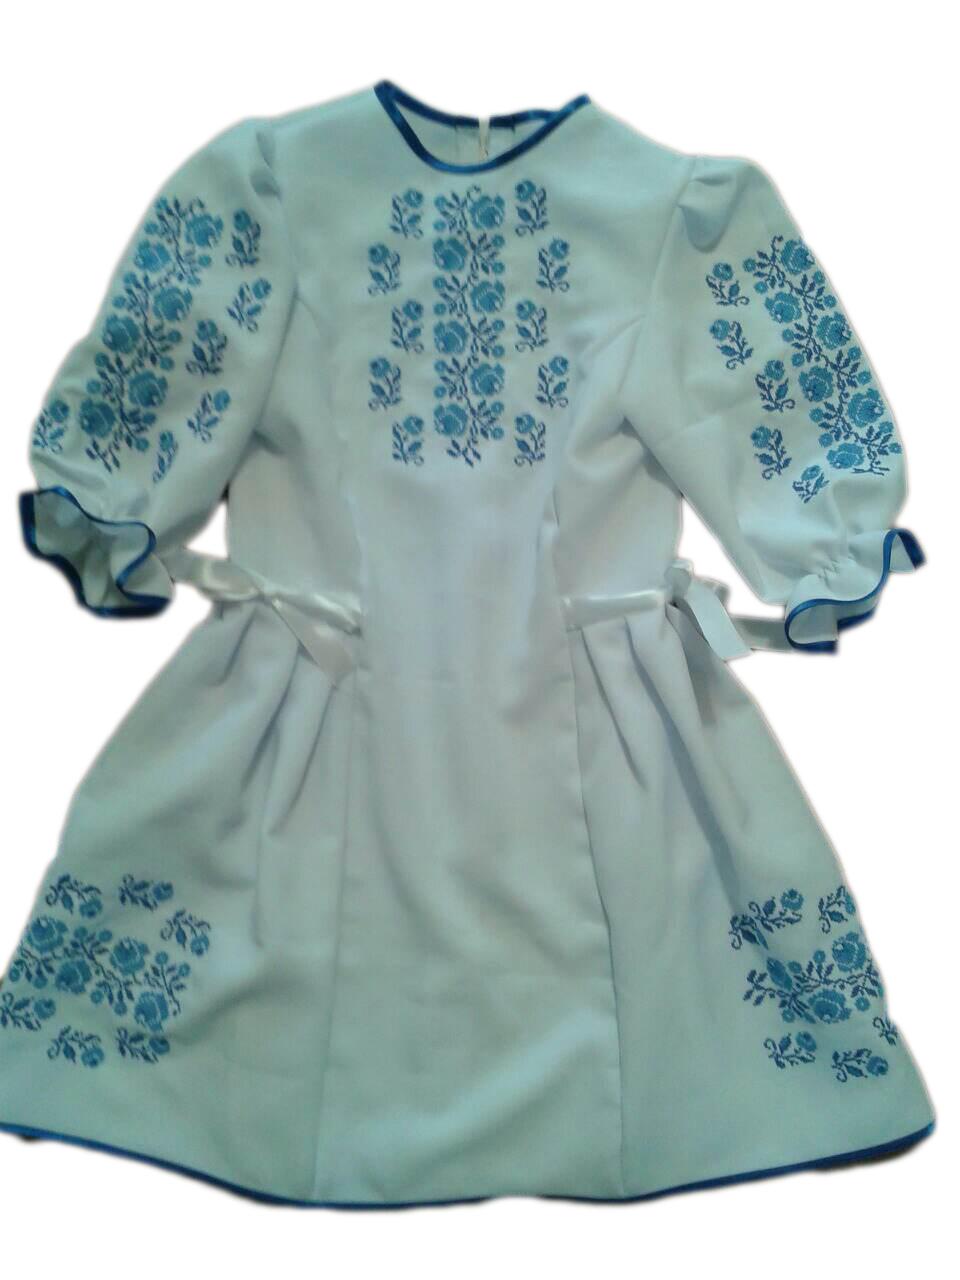 "Вишите плаття для дівчинки ""Нейтліс"" (Вышитое платье для девочки ""Нейтлис"") DU-00012"